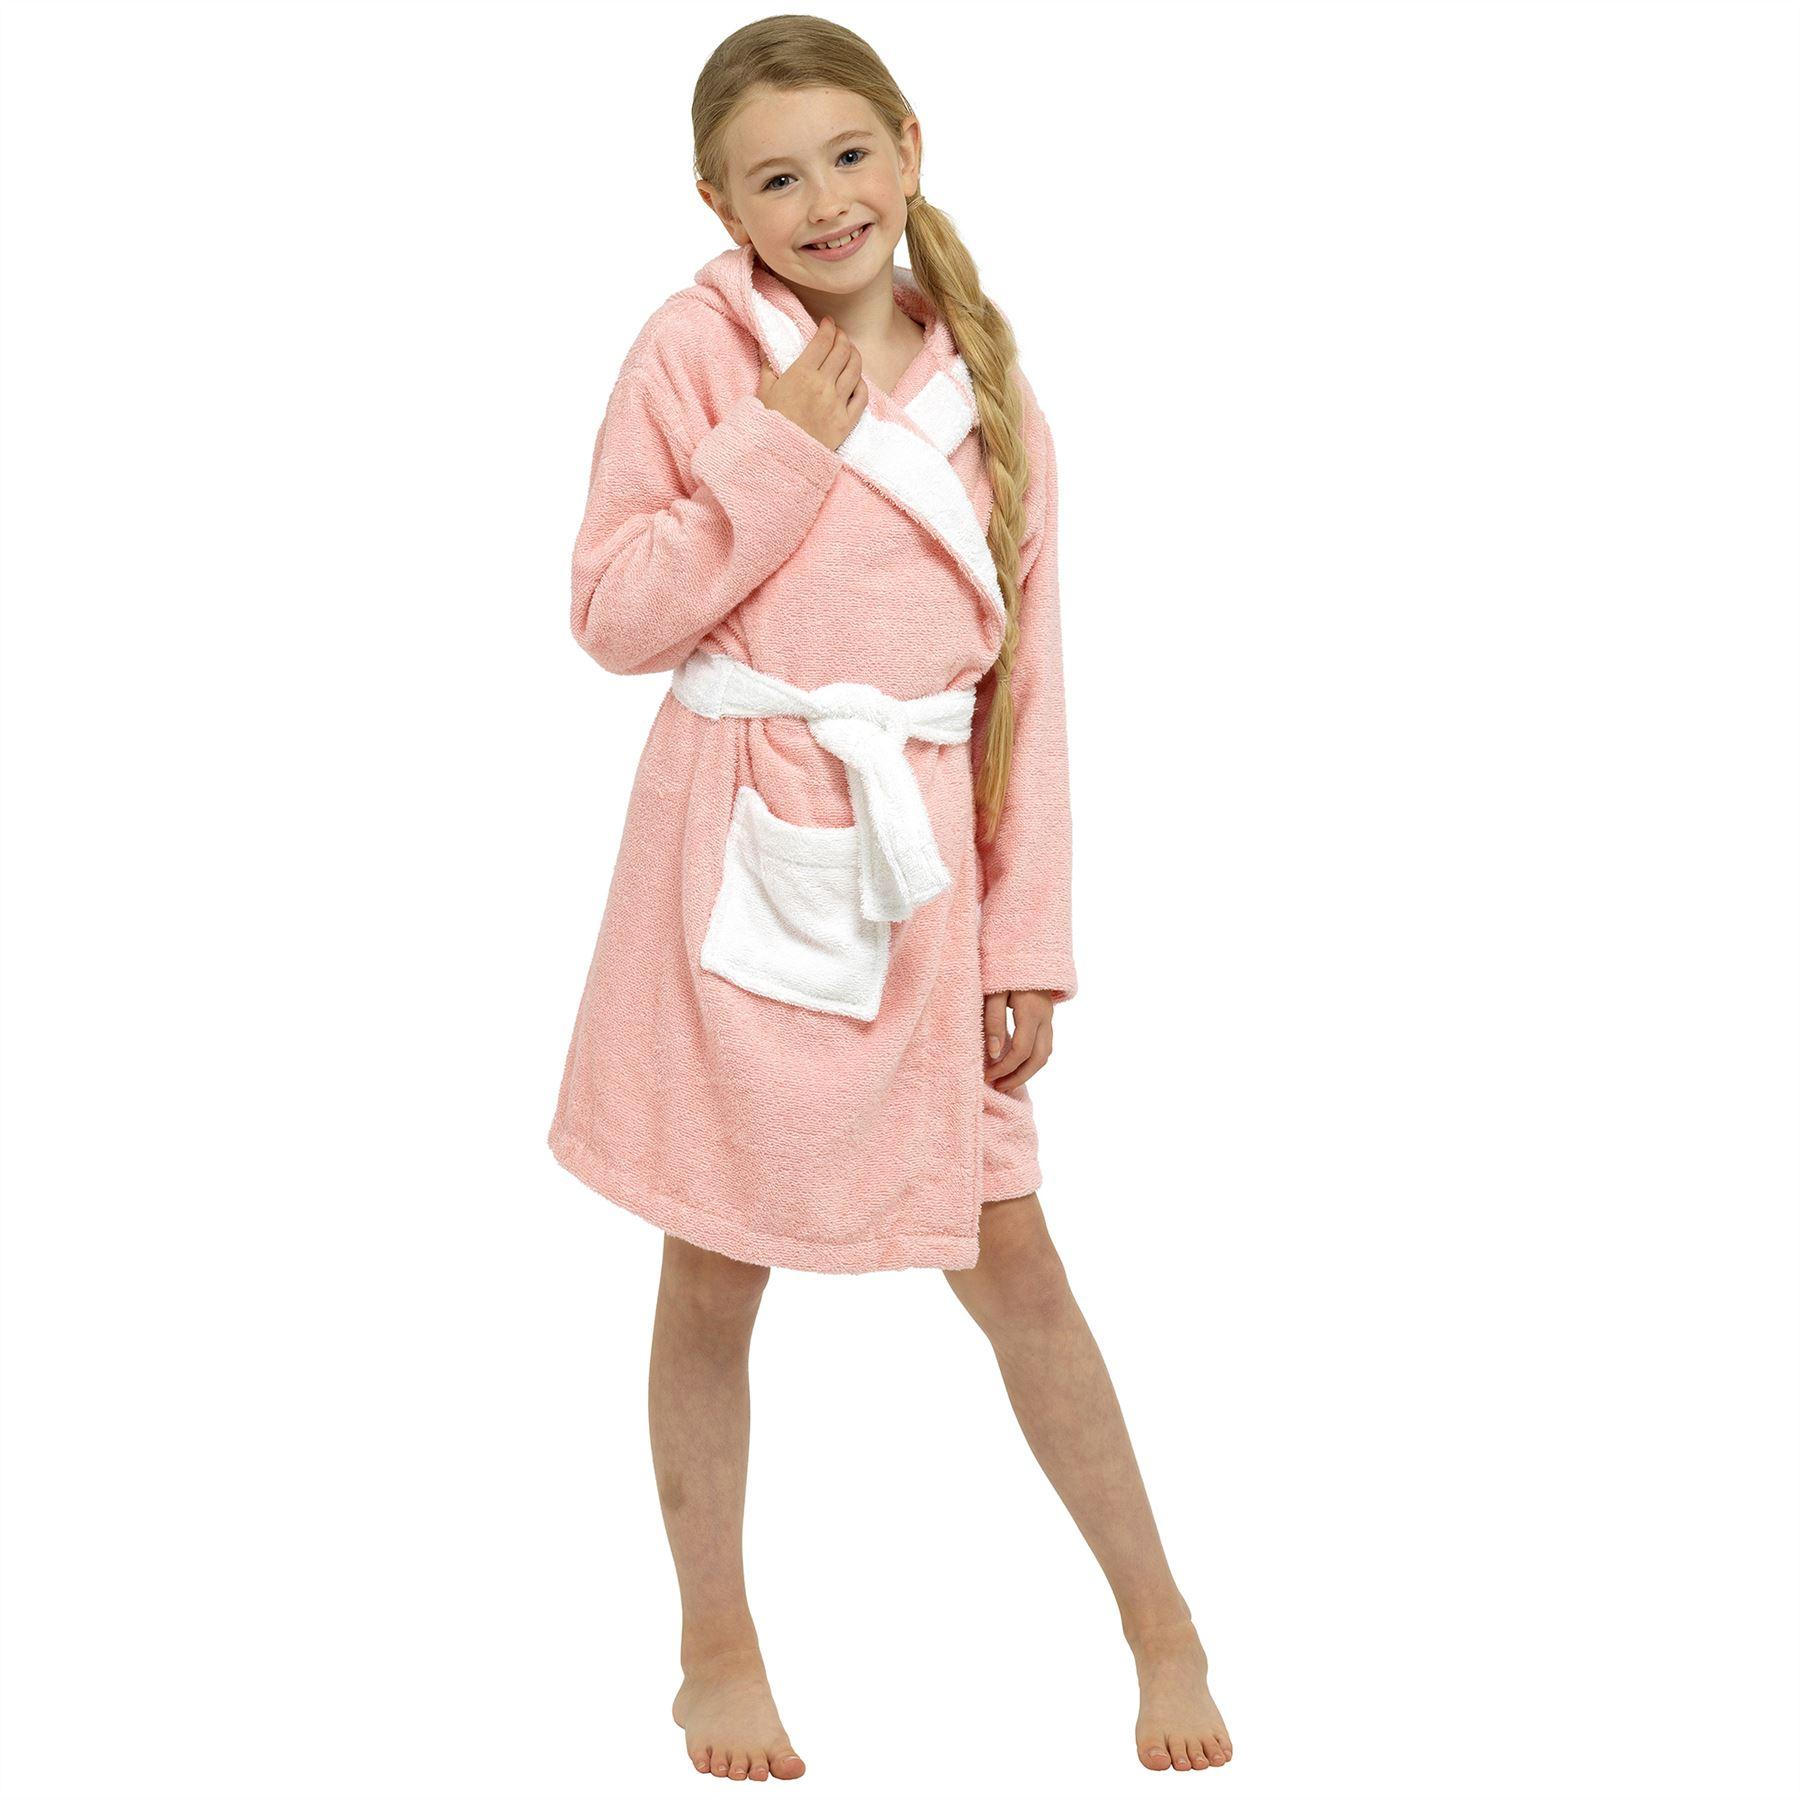 Kids Girls Boys Childrens Animal Hood Towelling Bathrobe Drying Dressing Gown